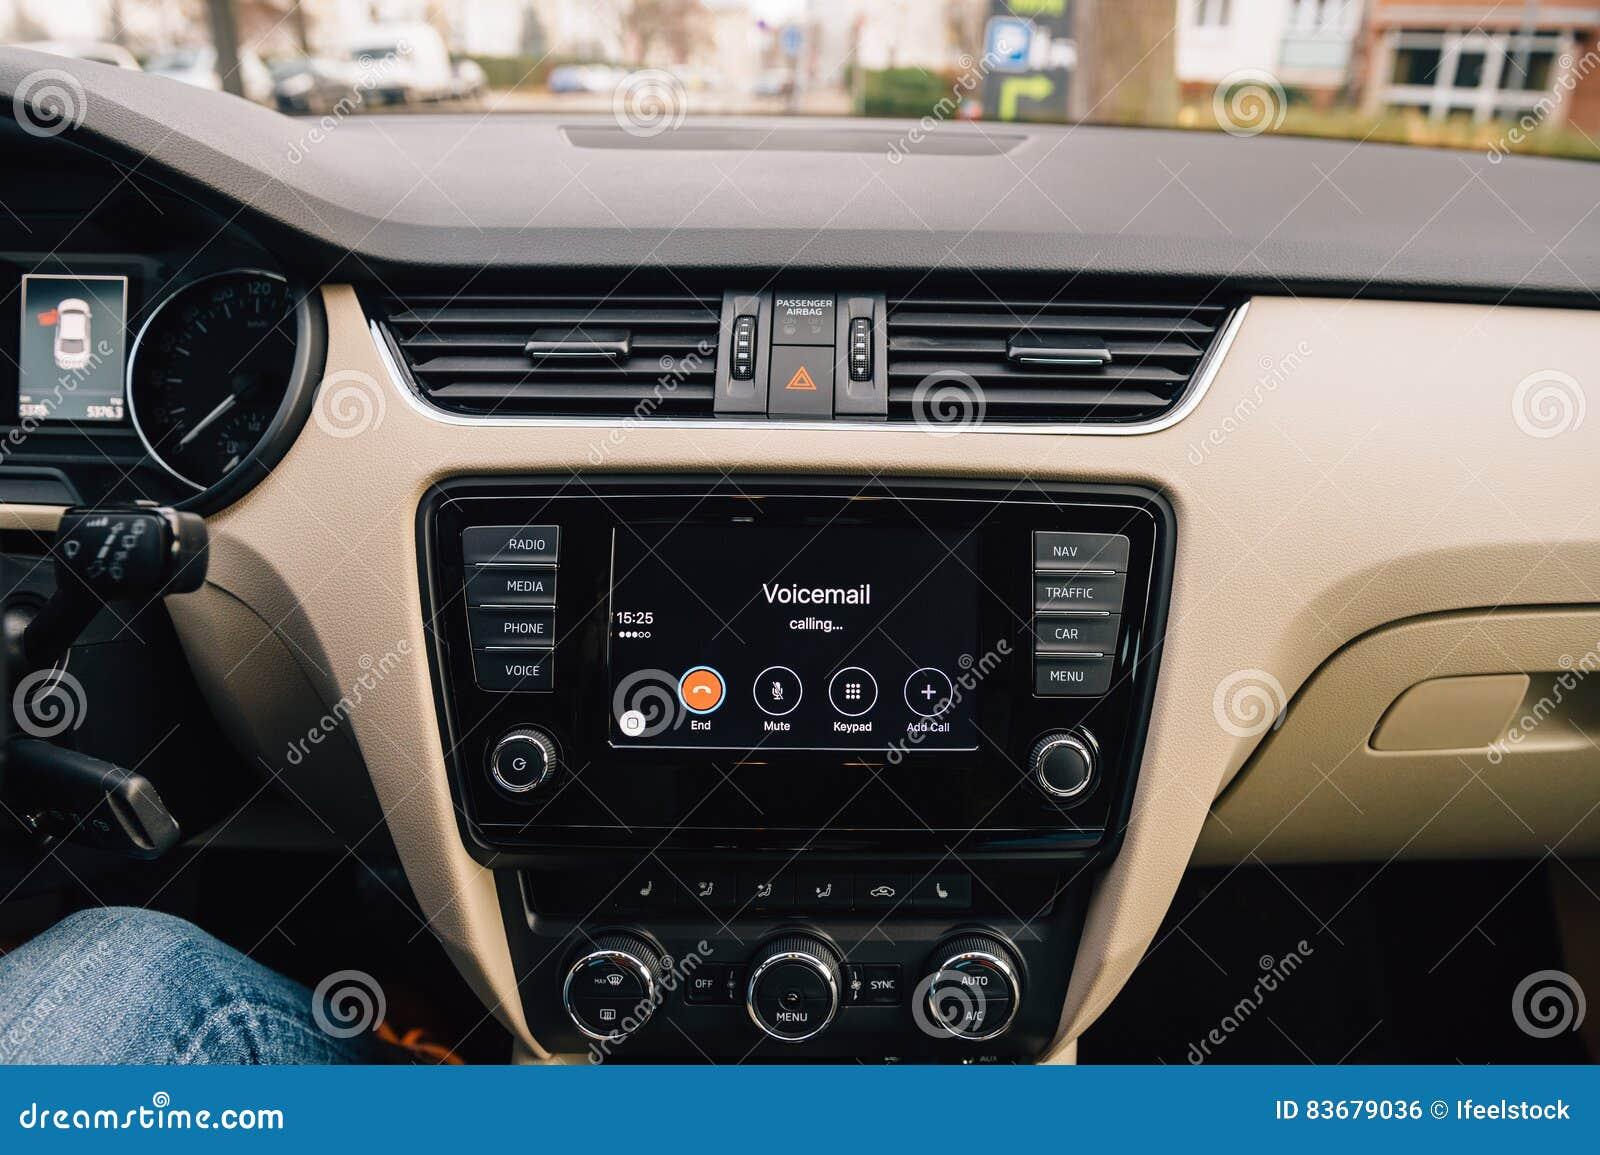 Voicemail call in Apple Car CarPlay